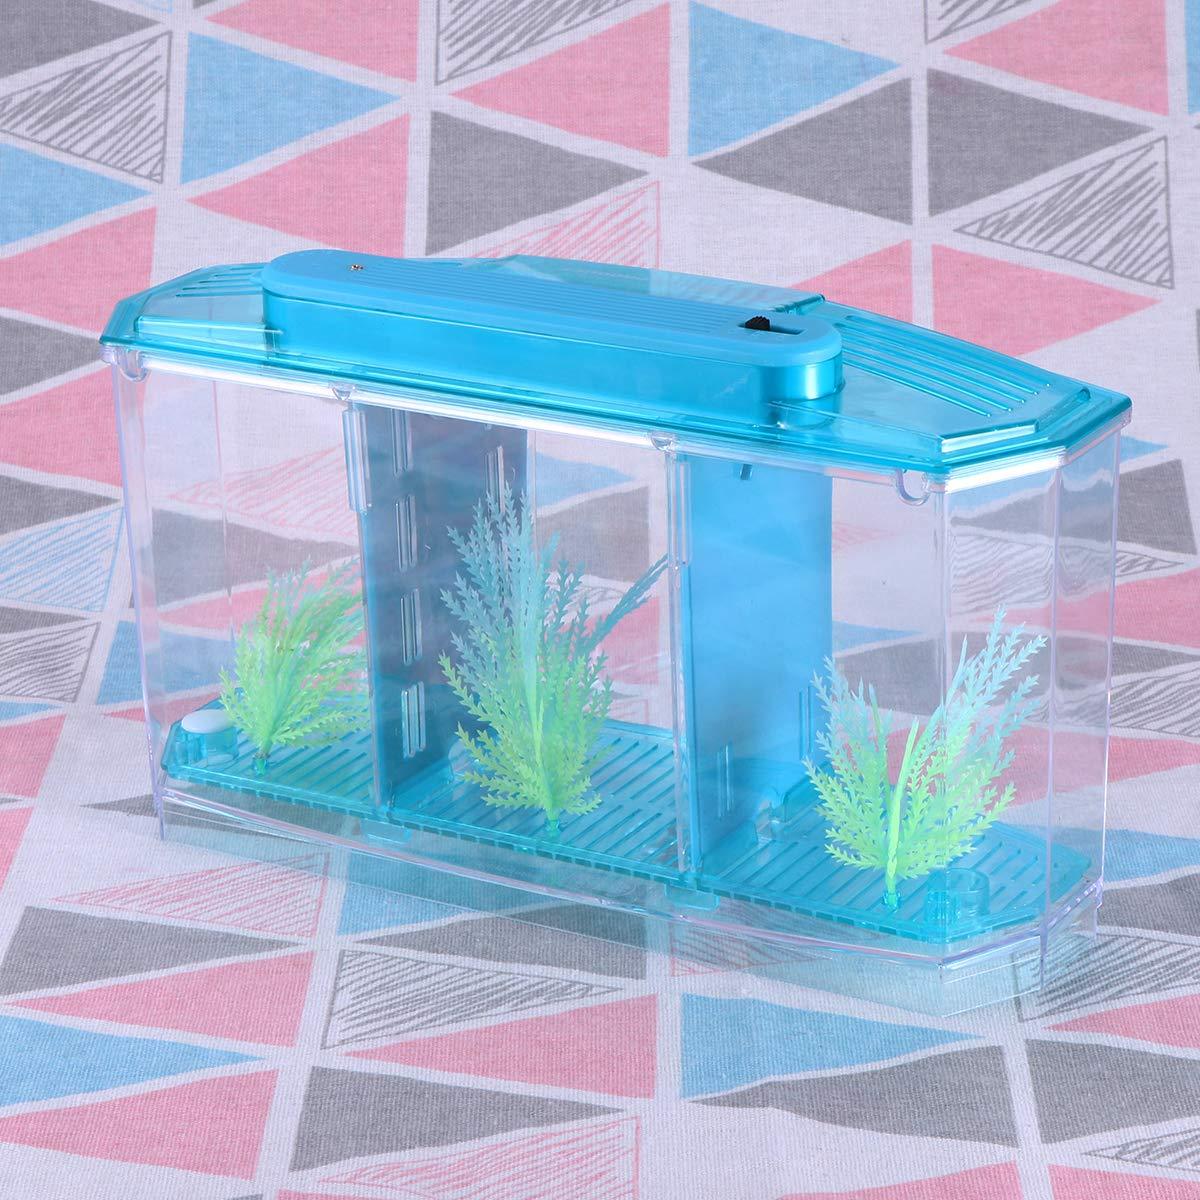 POPETPOP Mini Desktop Aquariums Fish Tank Ecological Goldfish Tank Hatchery Breeder Box for Living Office and Home dÃcor(Blue) by POPETPOP (Image #9)